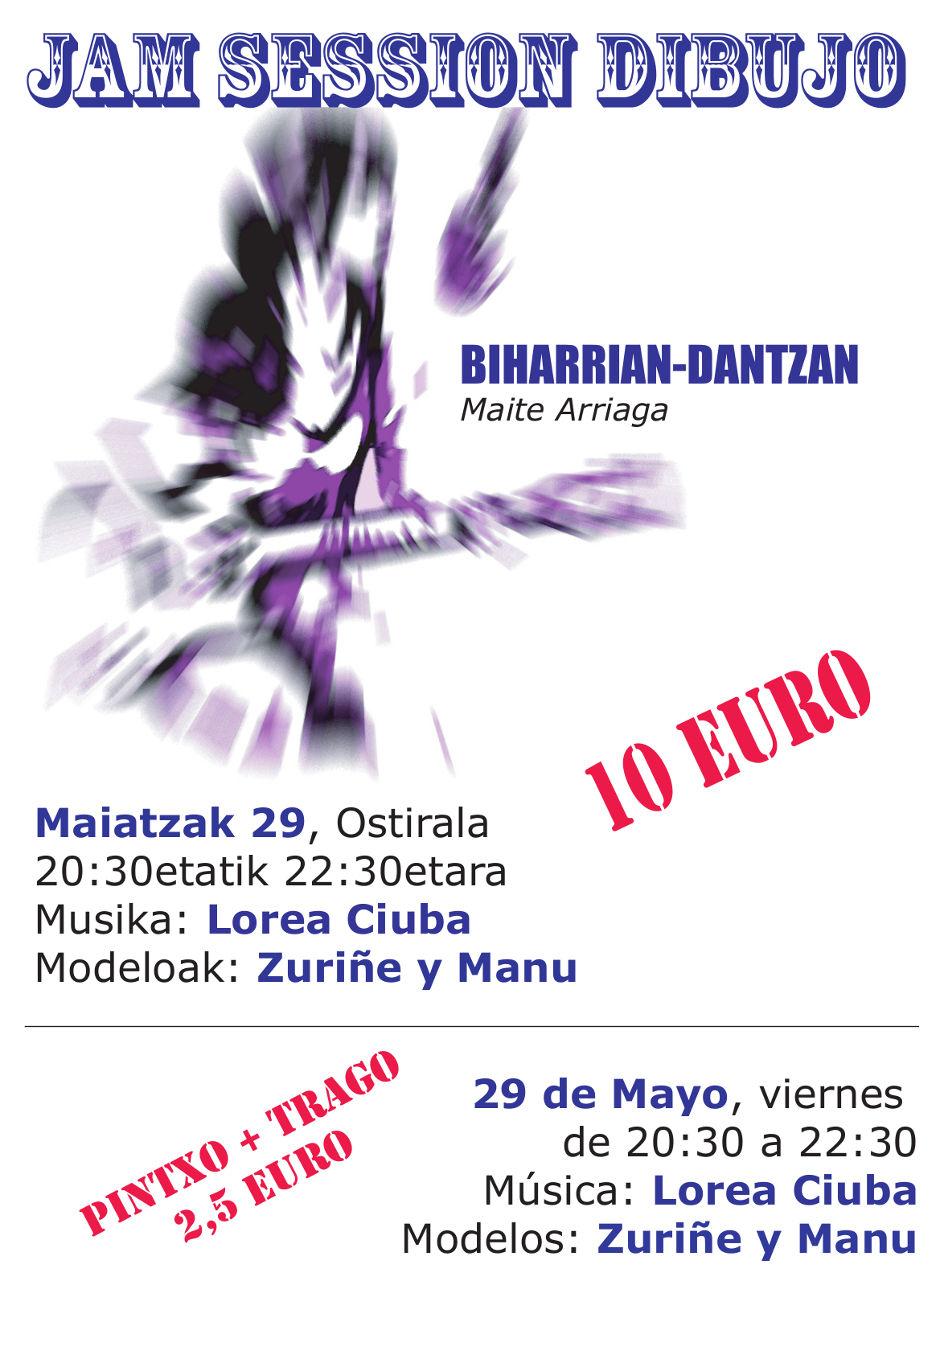 JAM SESSION DIBUJO 2020 - Maite Arriaga